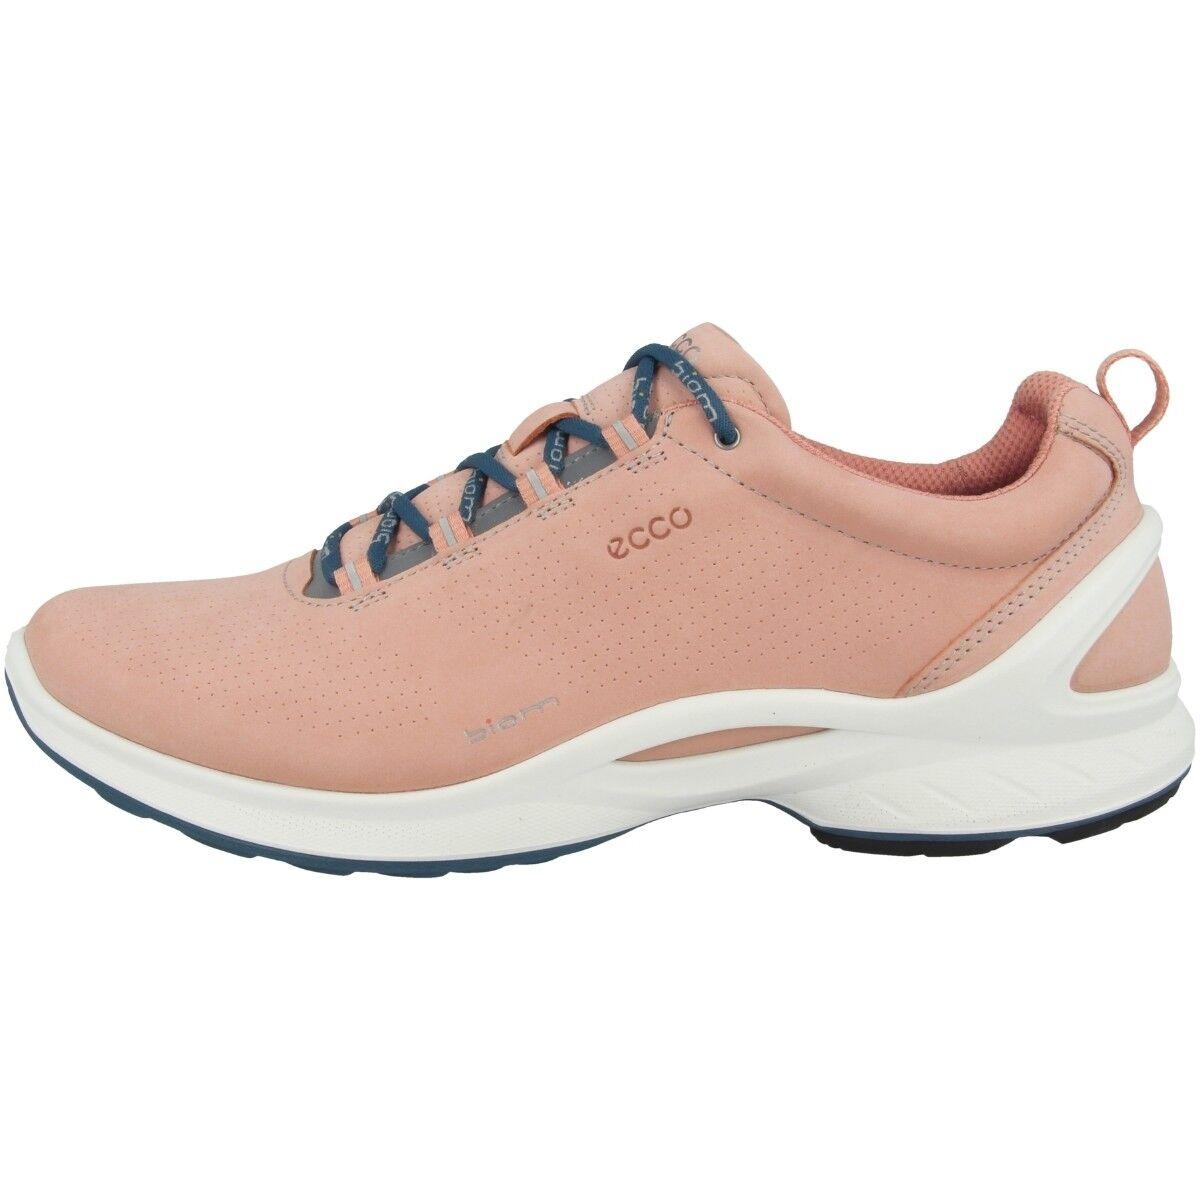 Ecco Biom Fjuel Cibus Schuhe Natural Motion Damen Turnschuhe clay 837533-01309